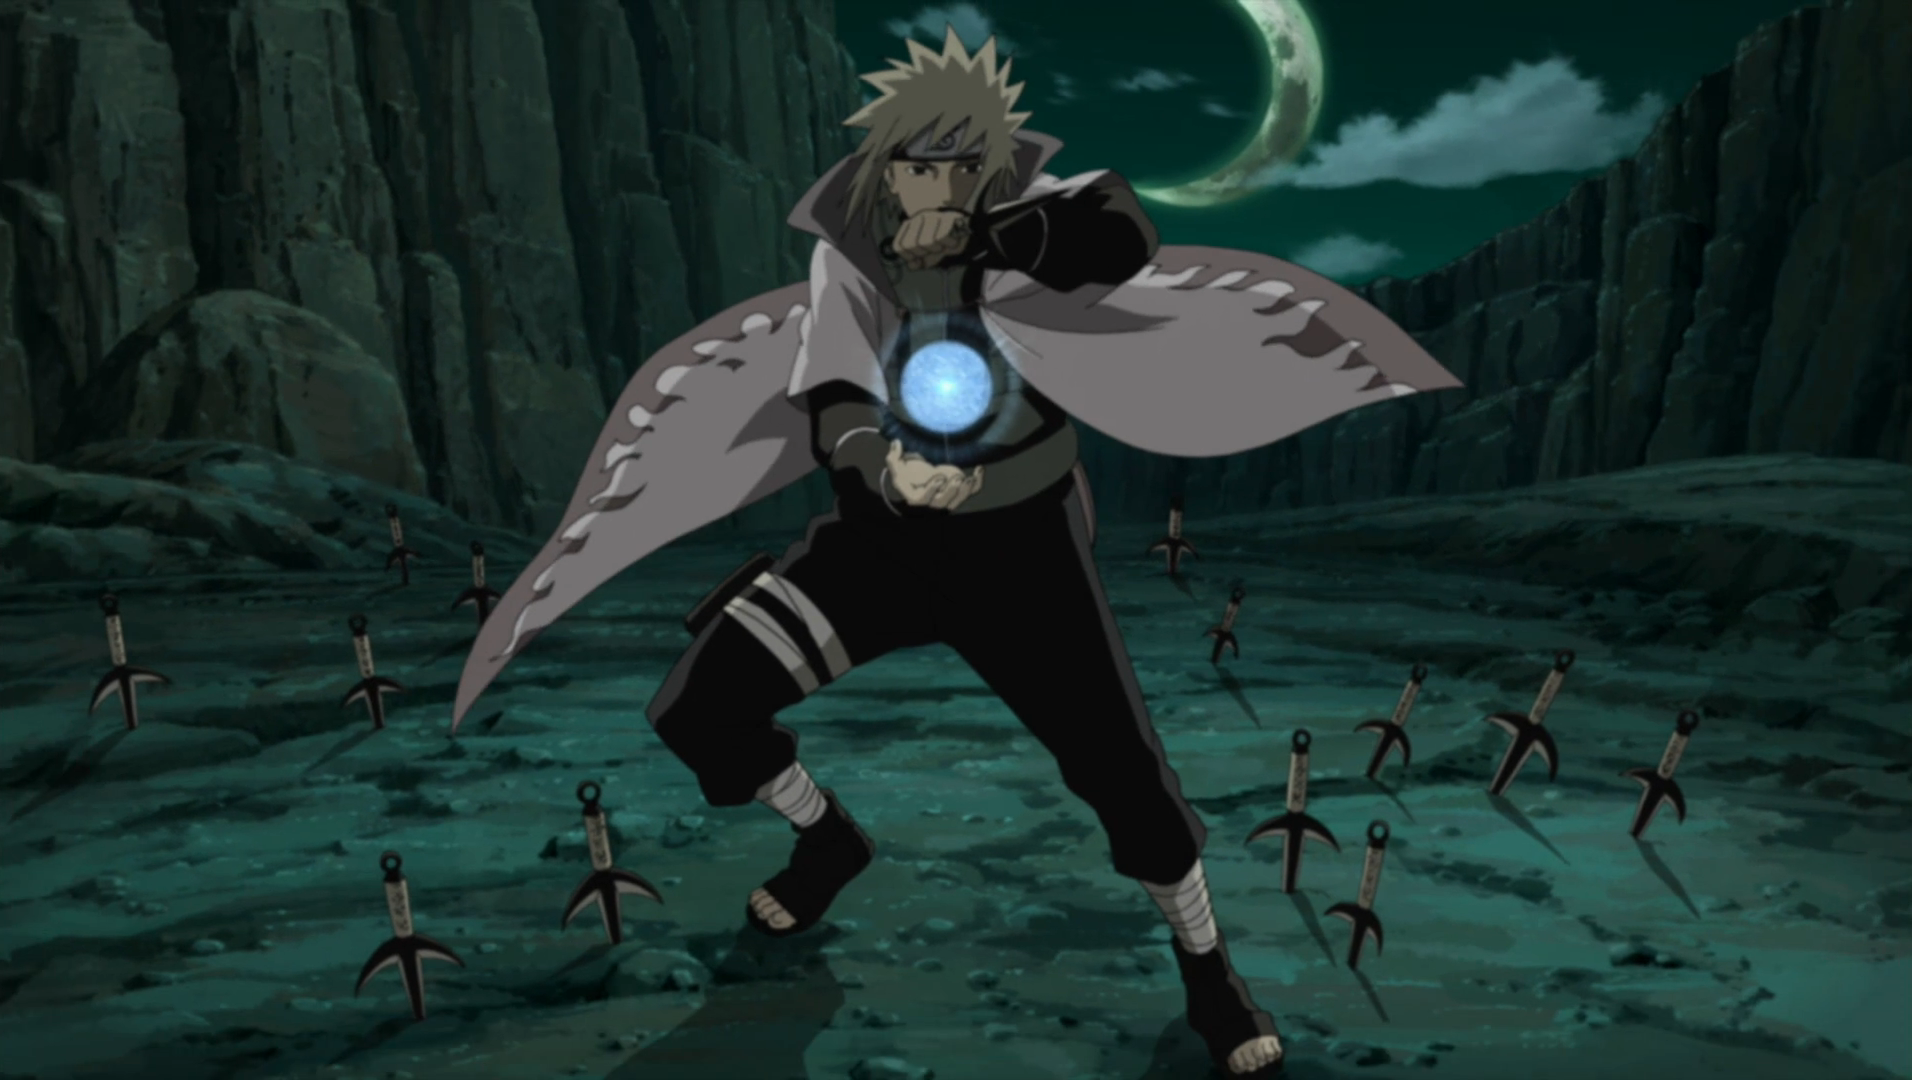 Big Mom Pirates (One Piece) vs Konoha (Naruto)